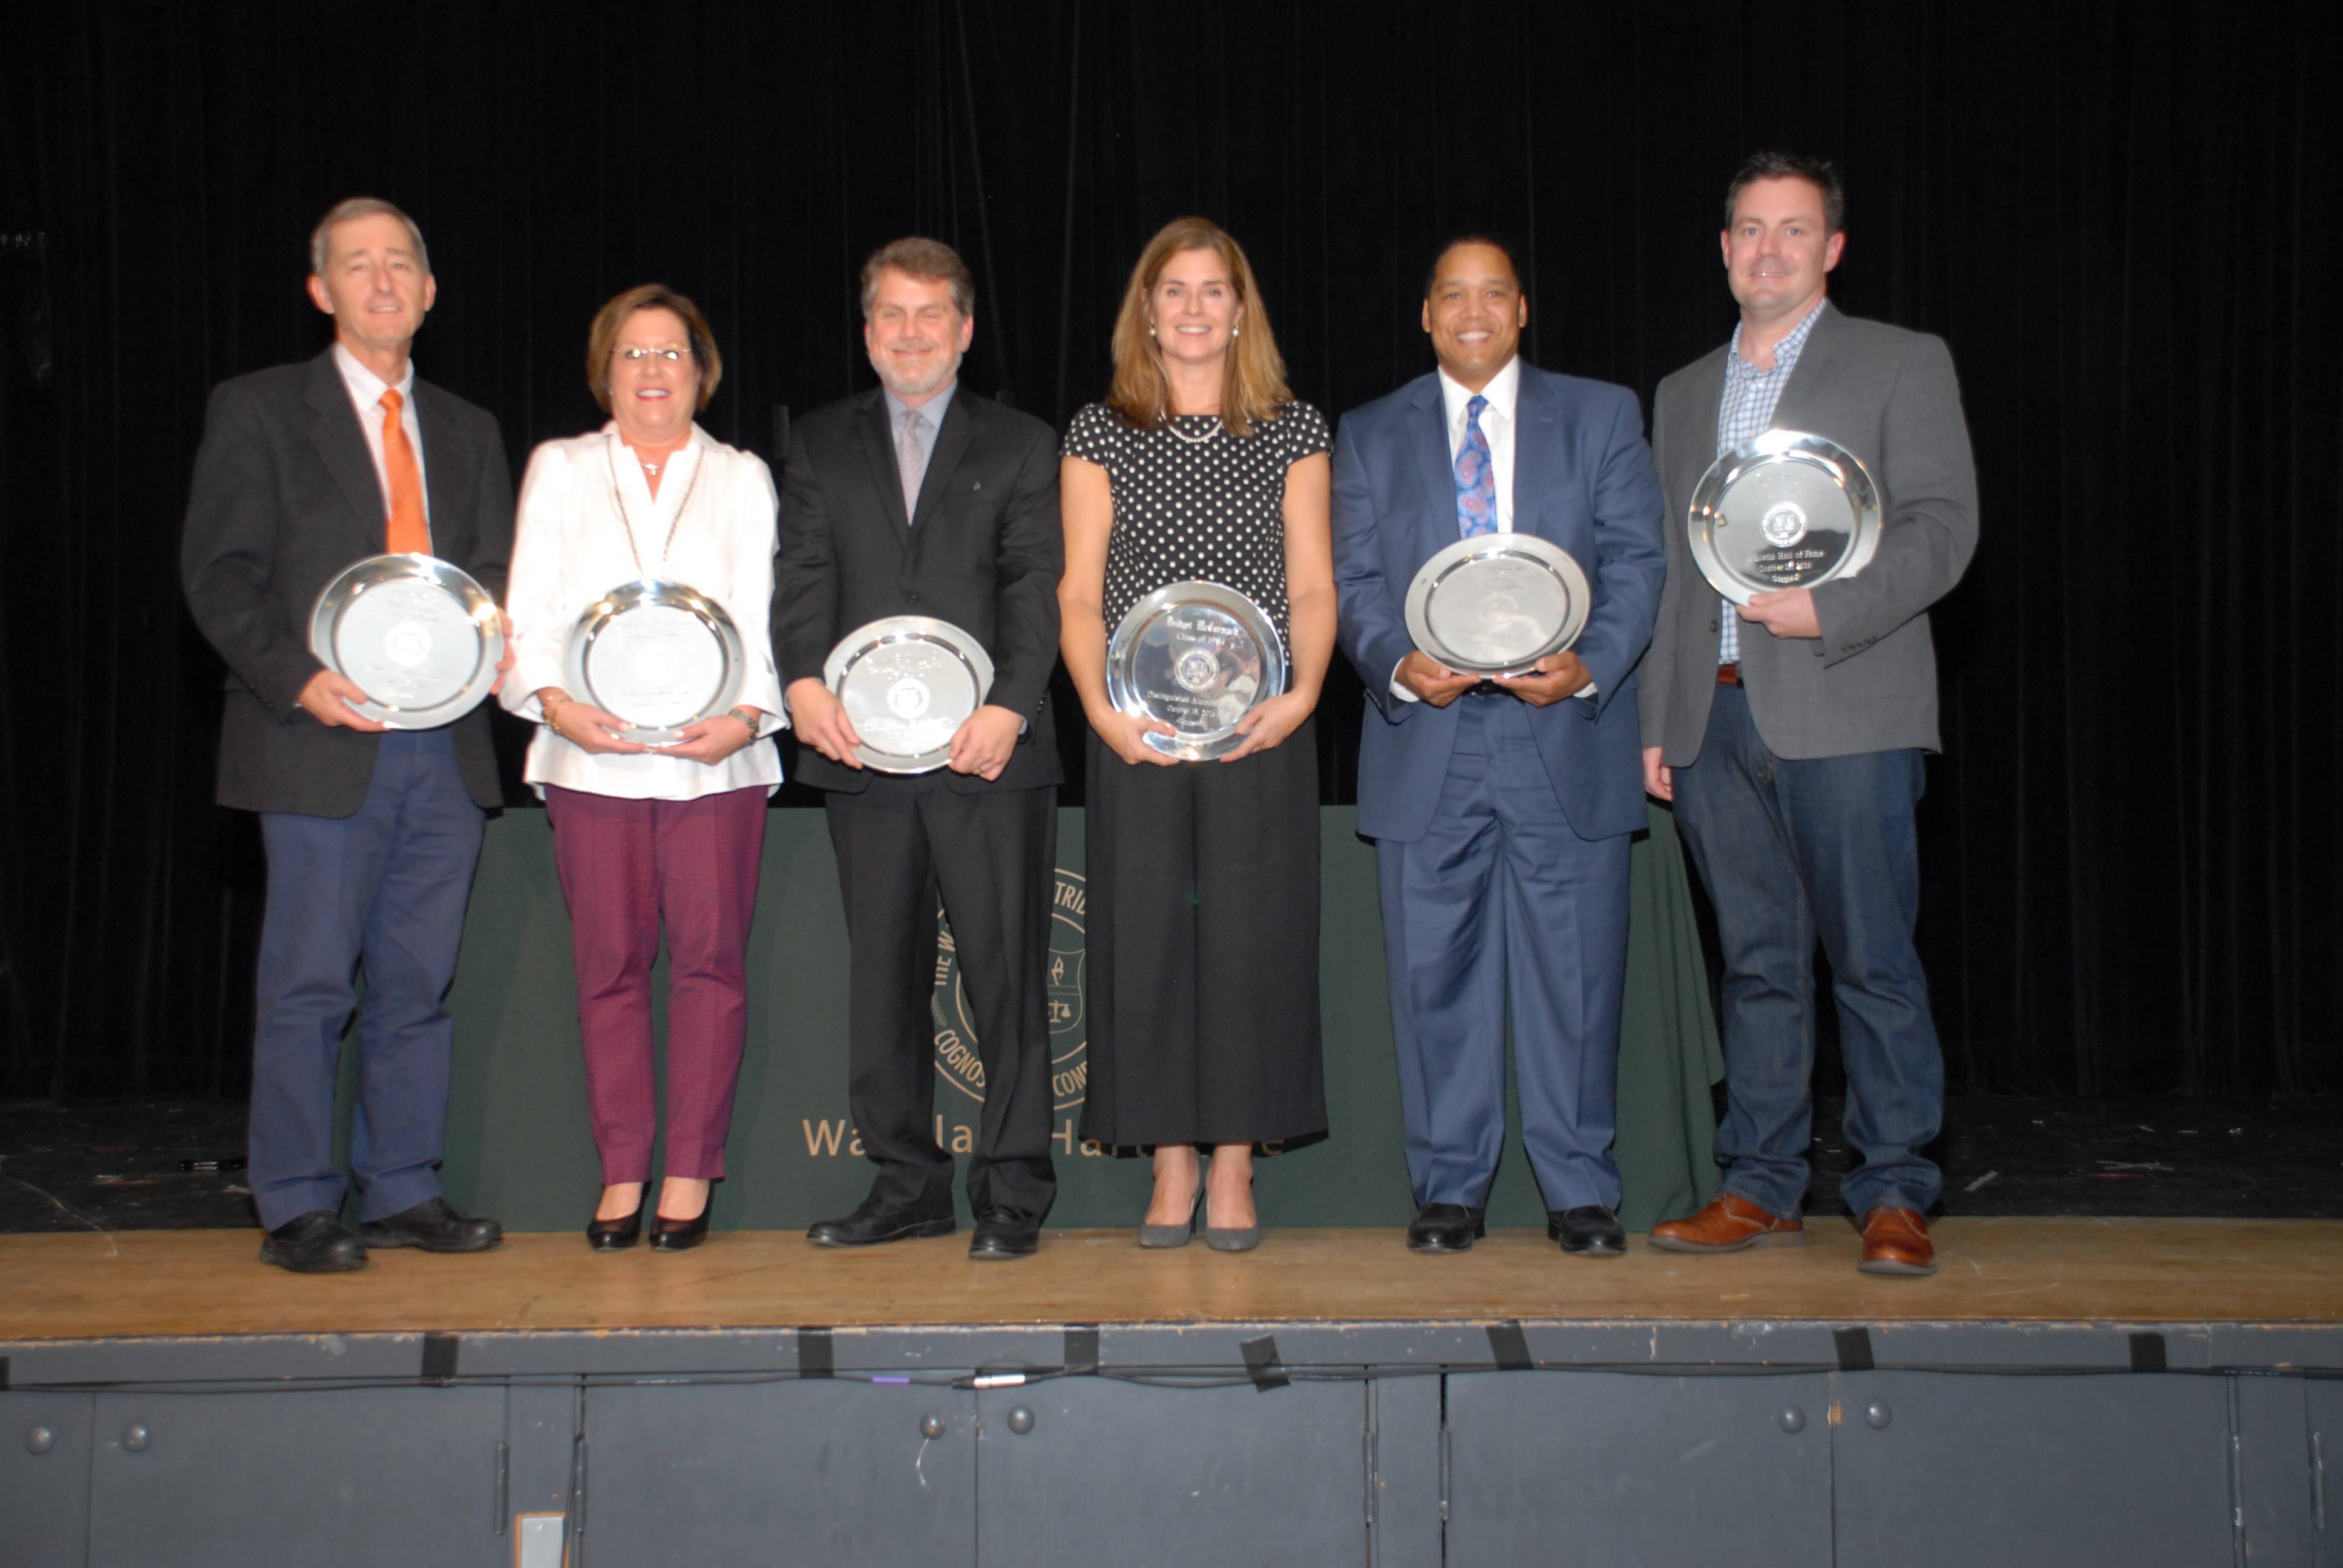 a5a768a48626dade634f_Award_Winners.JPG